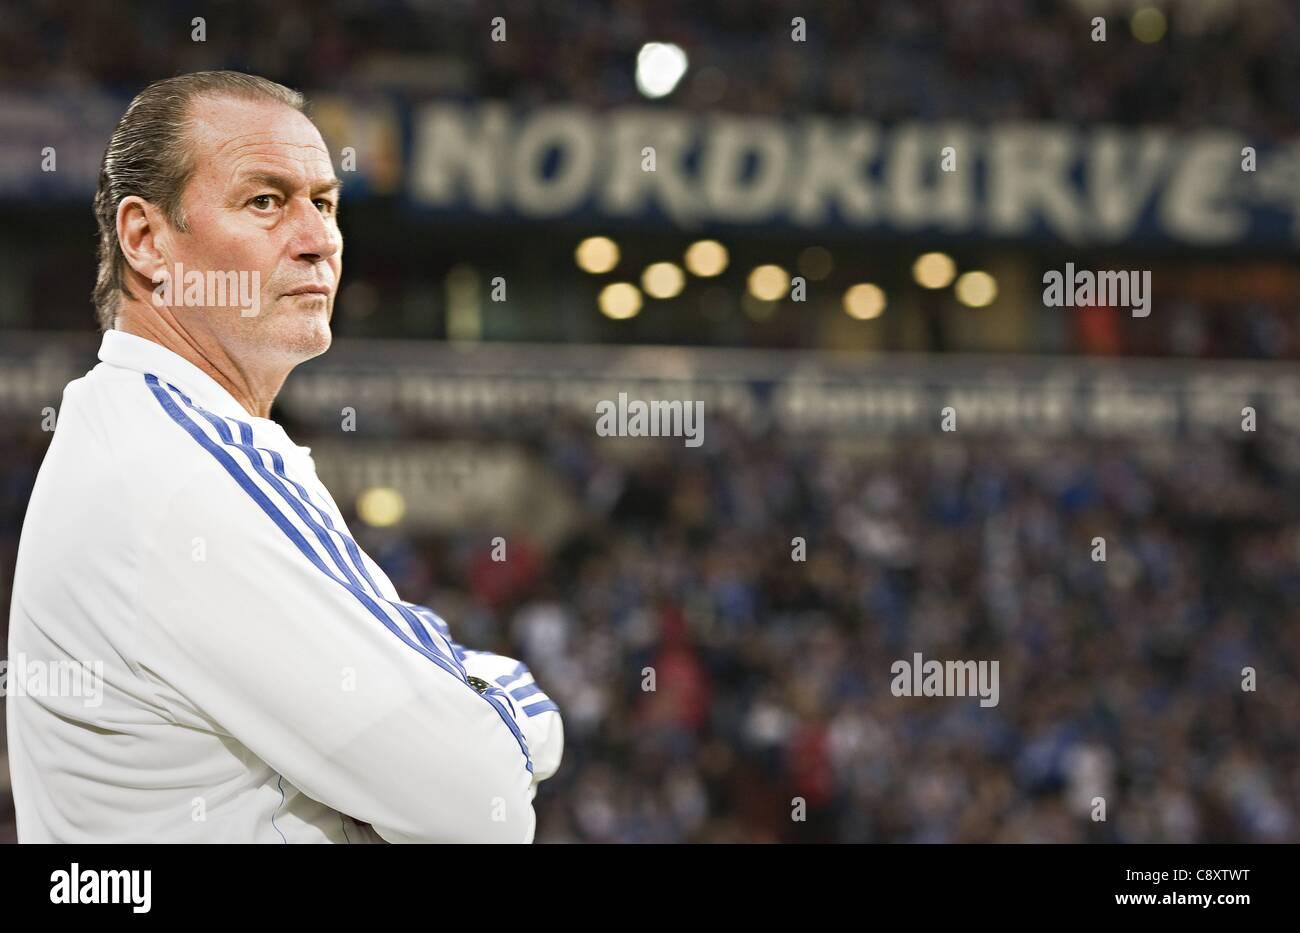 03 11 2011  UEFA Europa League Group stage  FC Schalke 04 versus AEK Larnaca Team manager Huub Stevens S04 - Stock Image